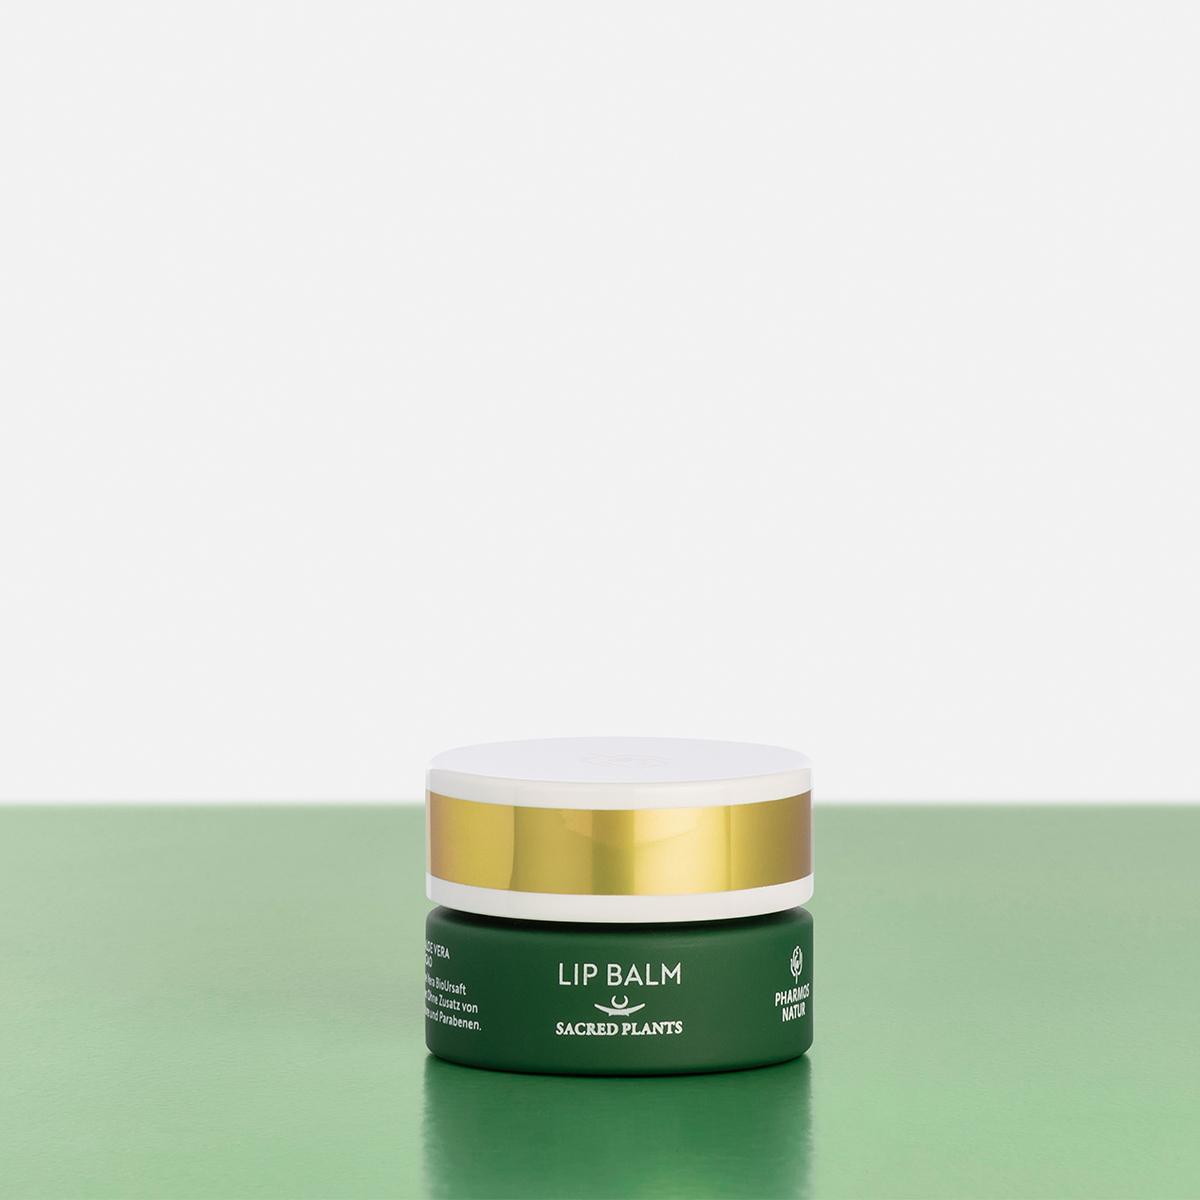 grüner Lip Balm Produktbild